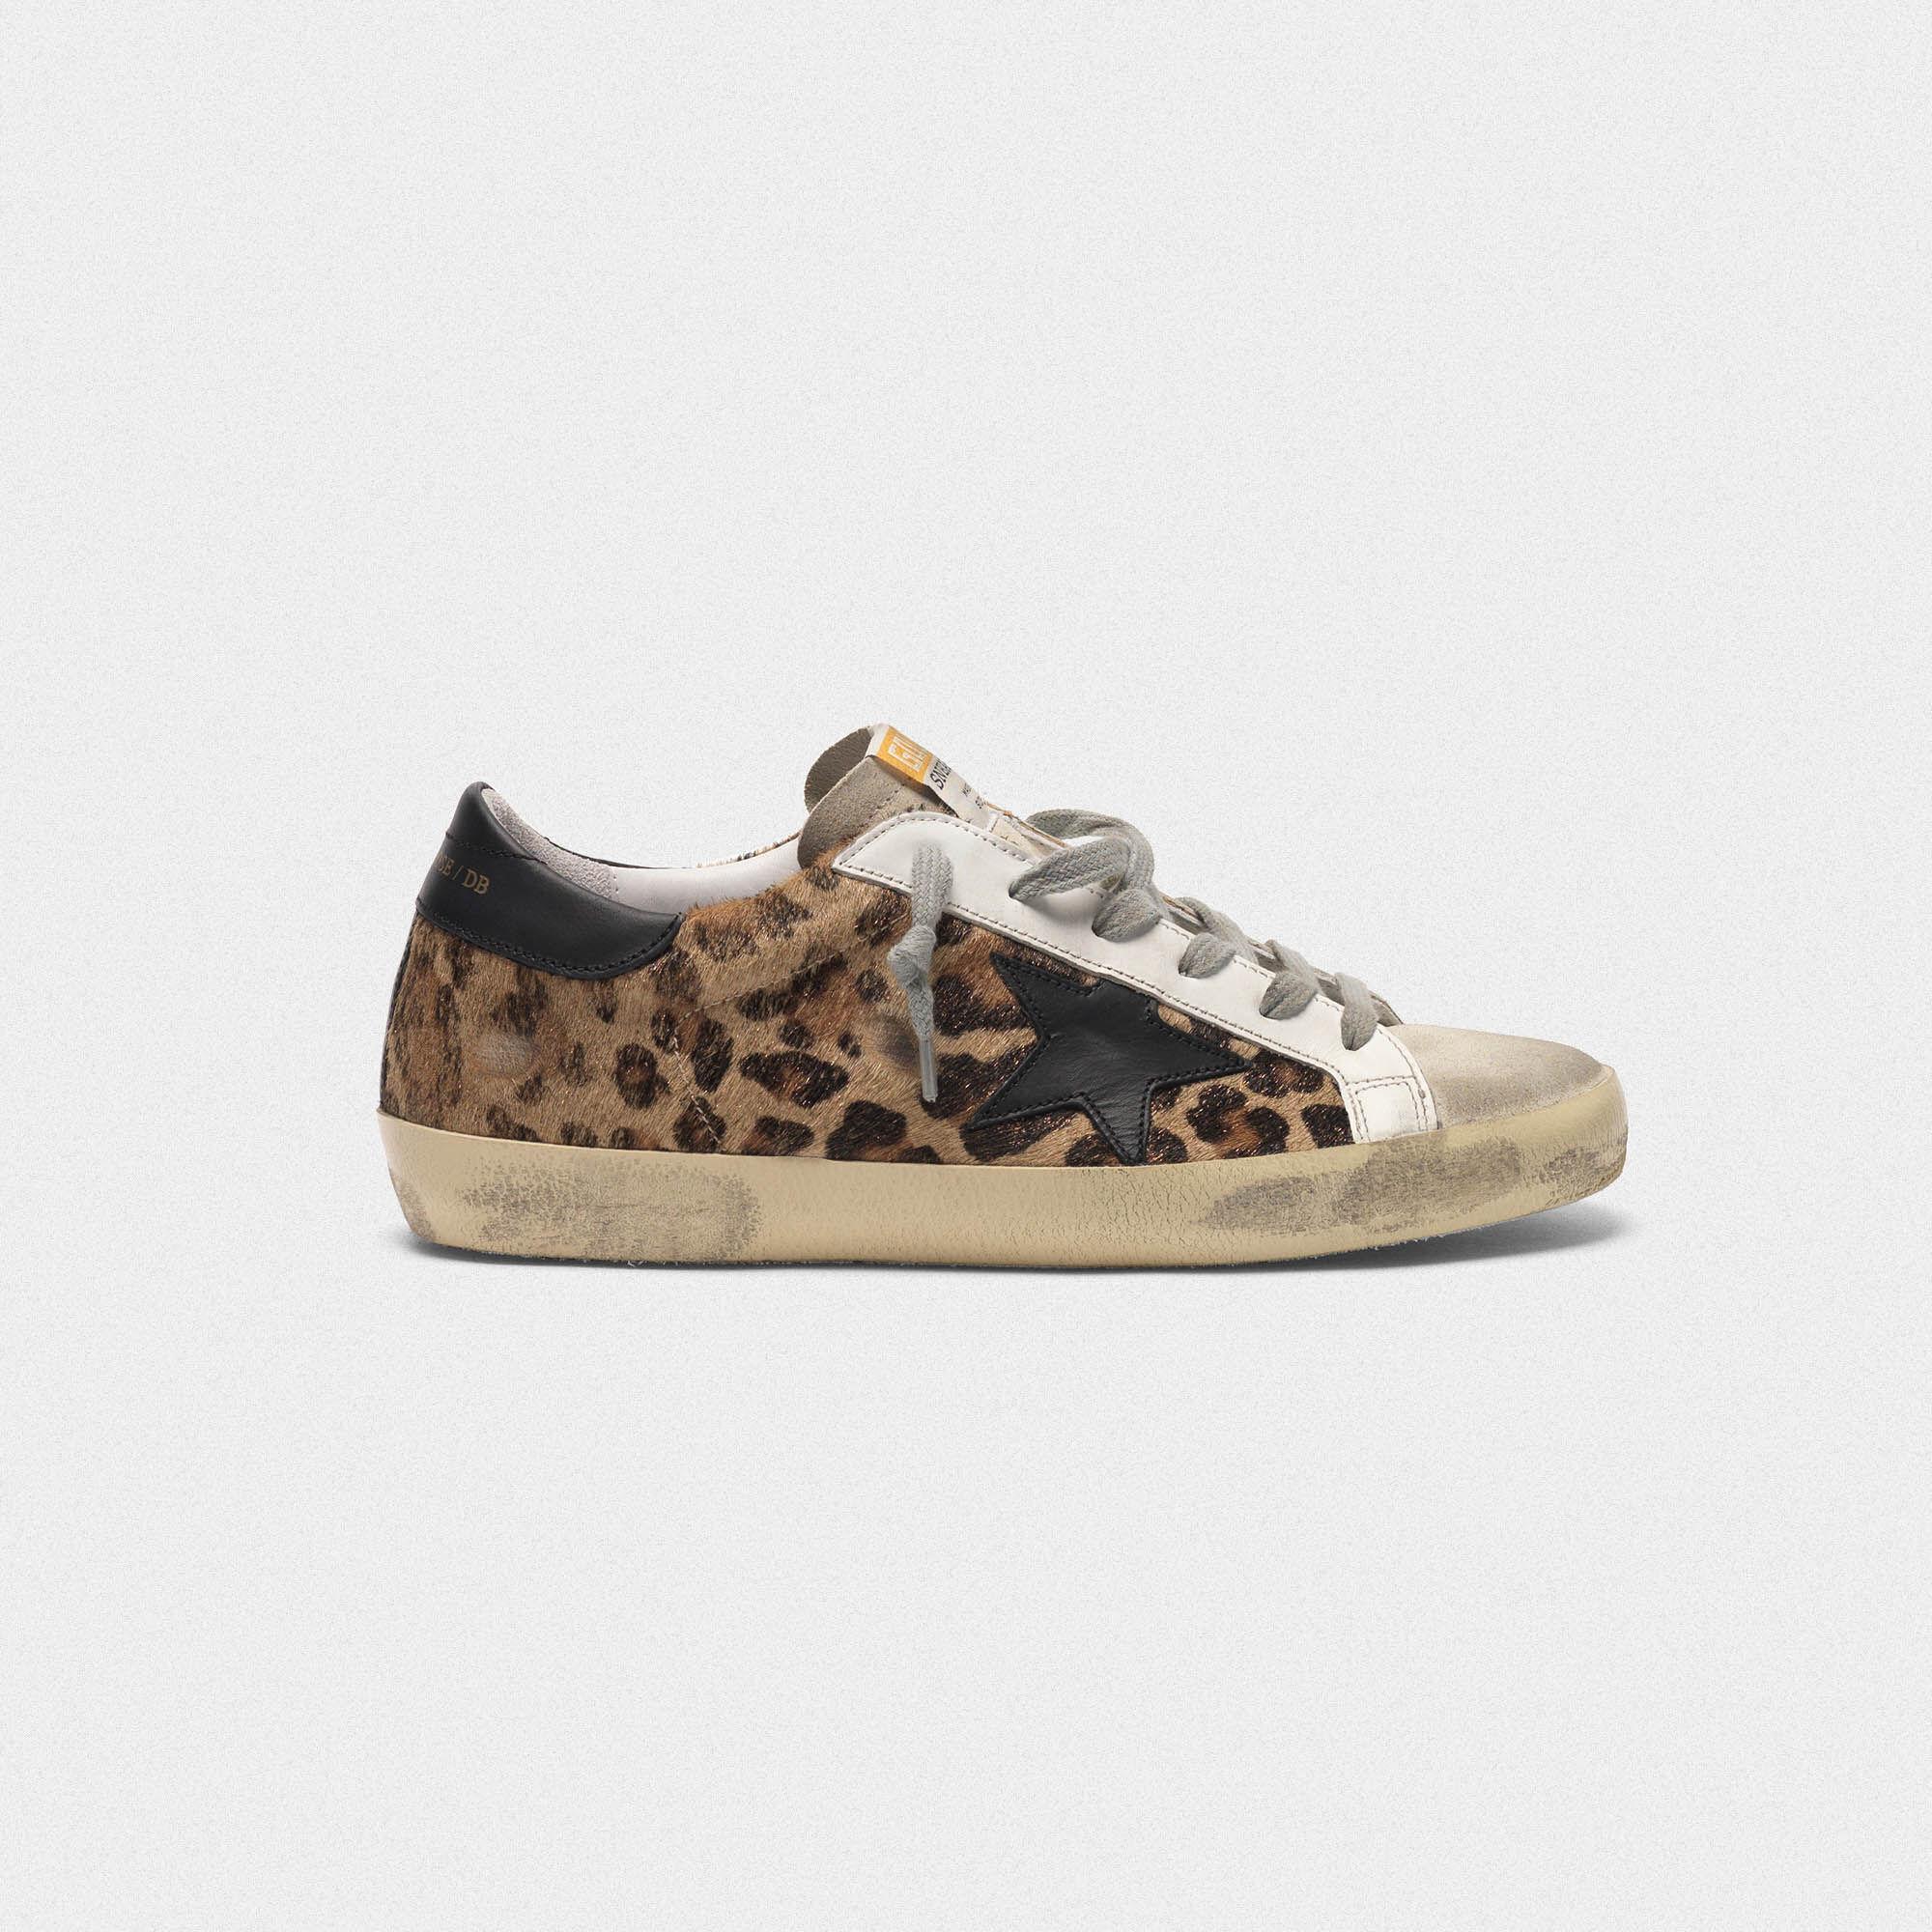 Geflocktem Aus Superstar Sneakers Leder Leoparden Print Mit gb7Yf6vIy